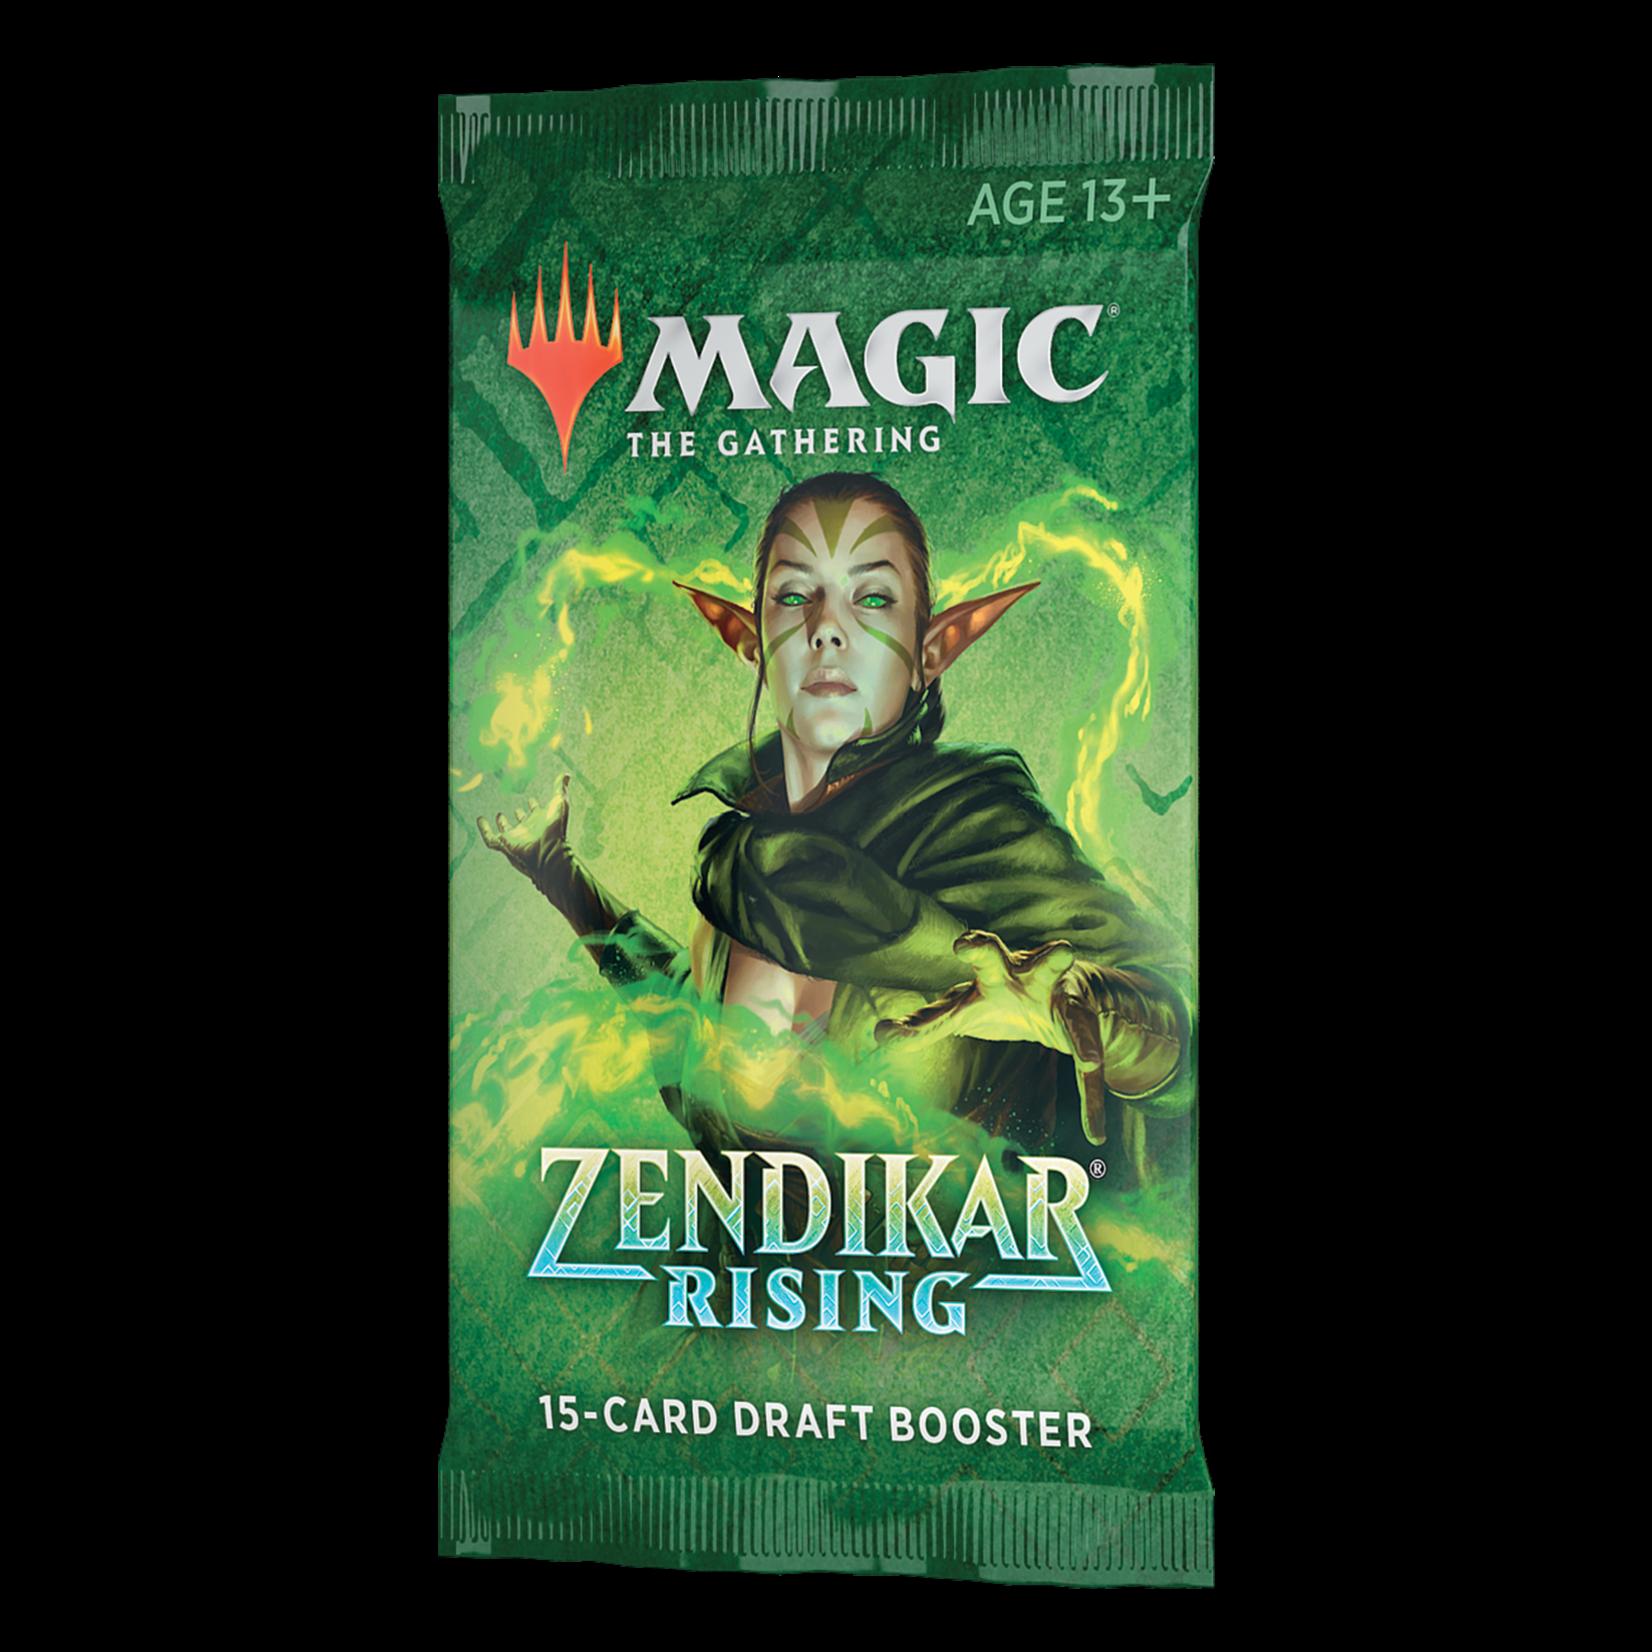 Magic: The Gathering Magic: The Gathering - Zendikar Rising Draft Booster Pack